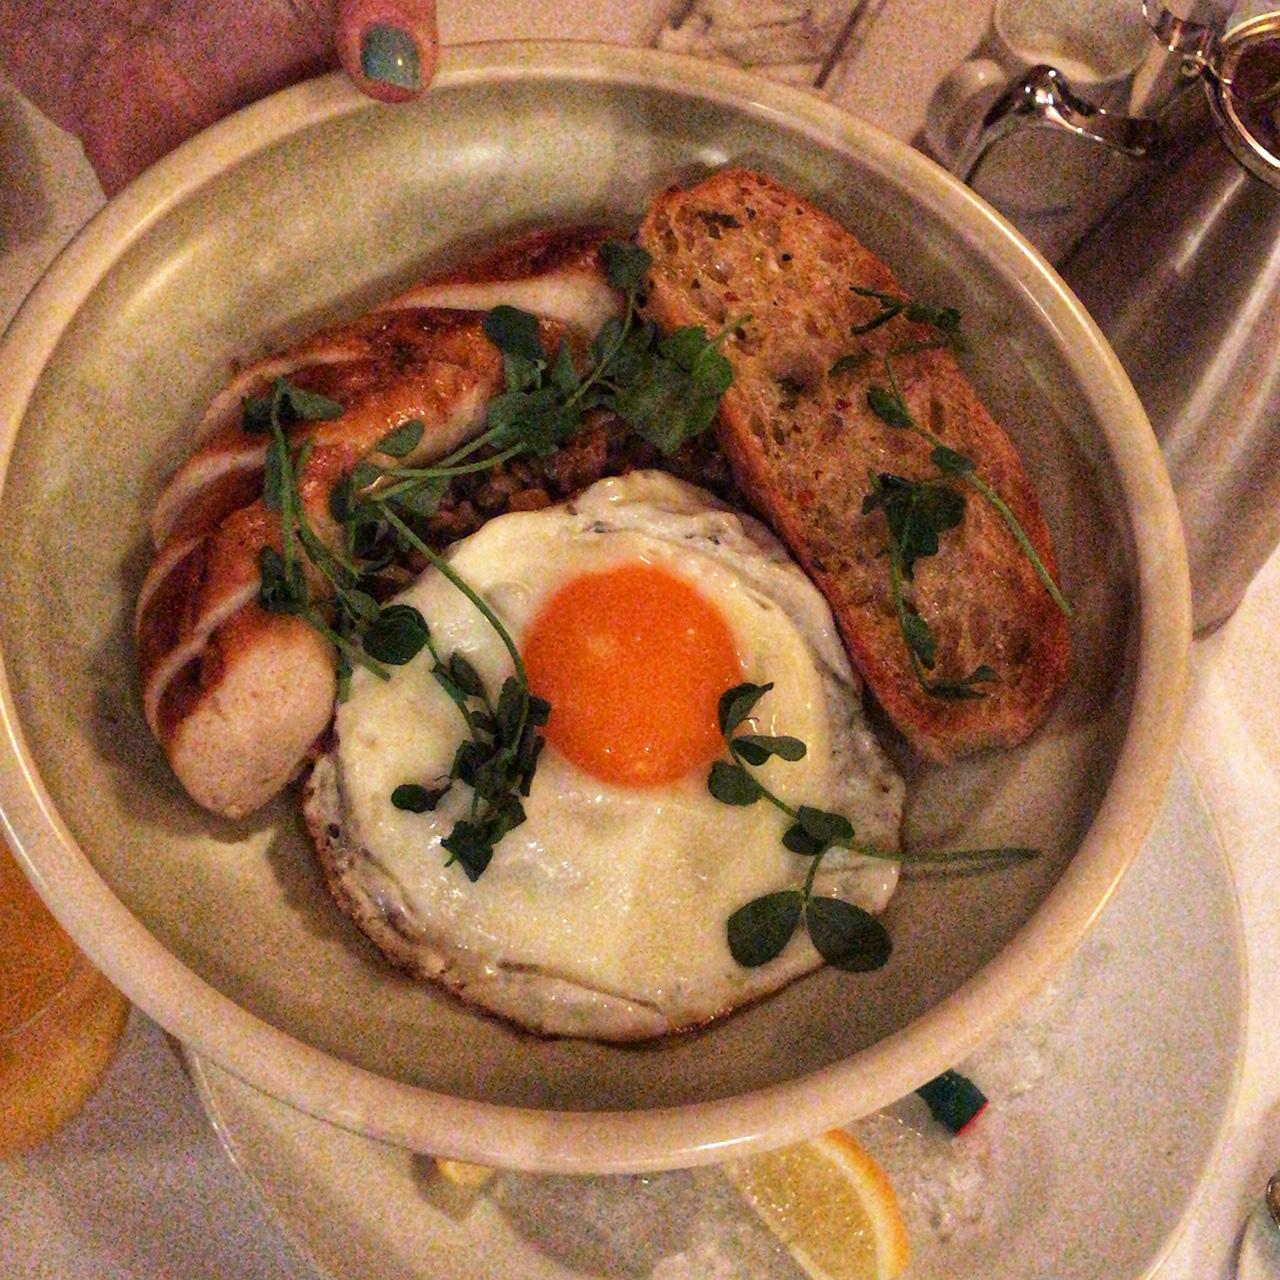 Manitoban cassoulet, veal sausage